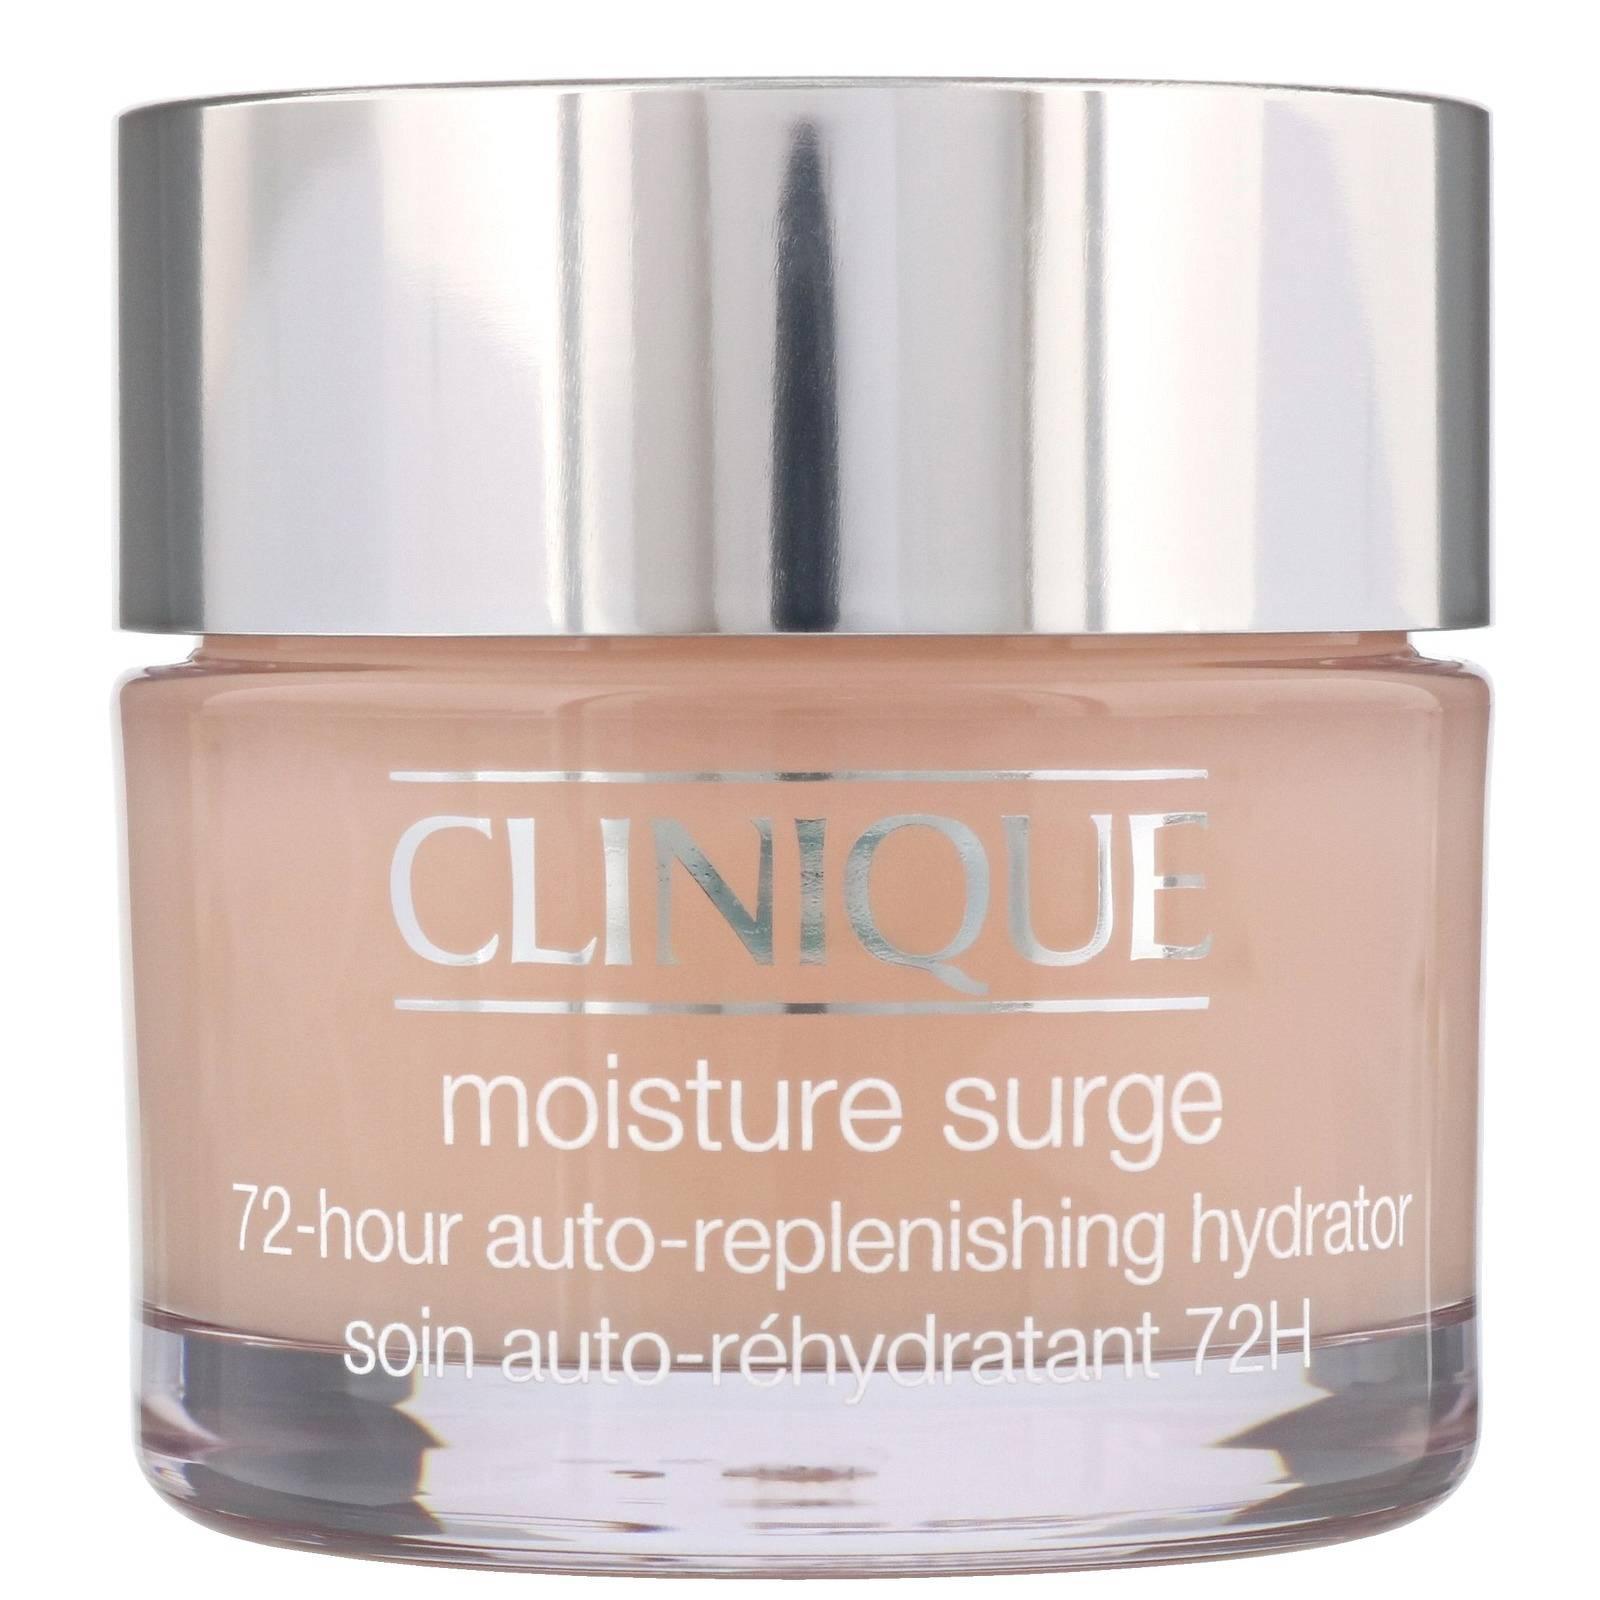 Clinique Moisture Surge 72-Hour Auto-Replenishing Hydrator 75 ml